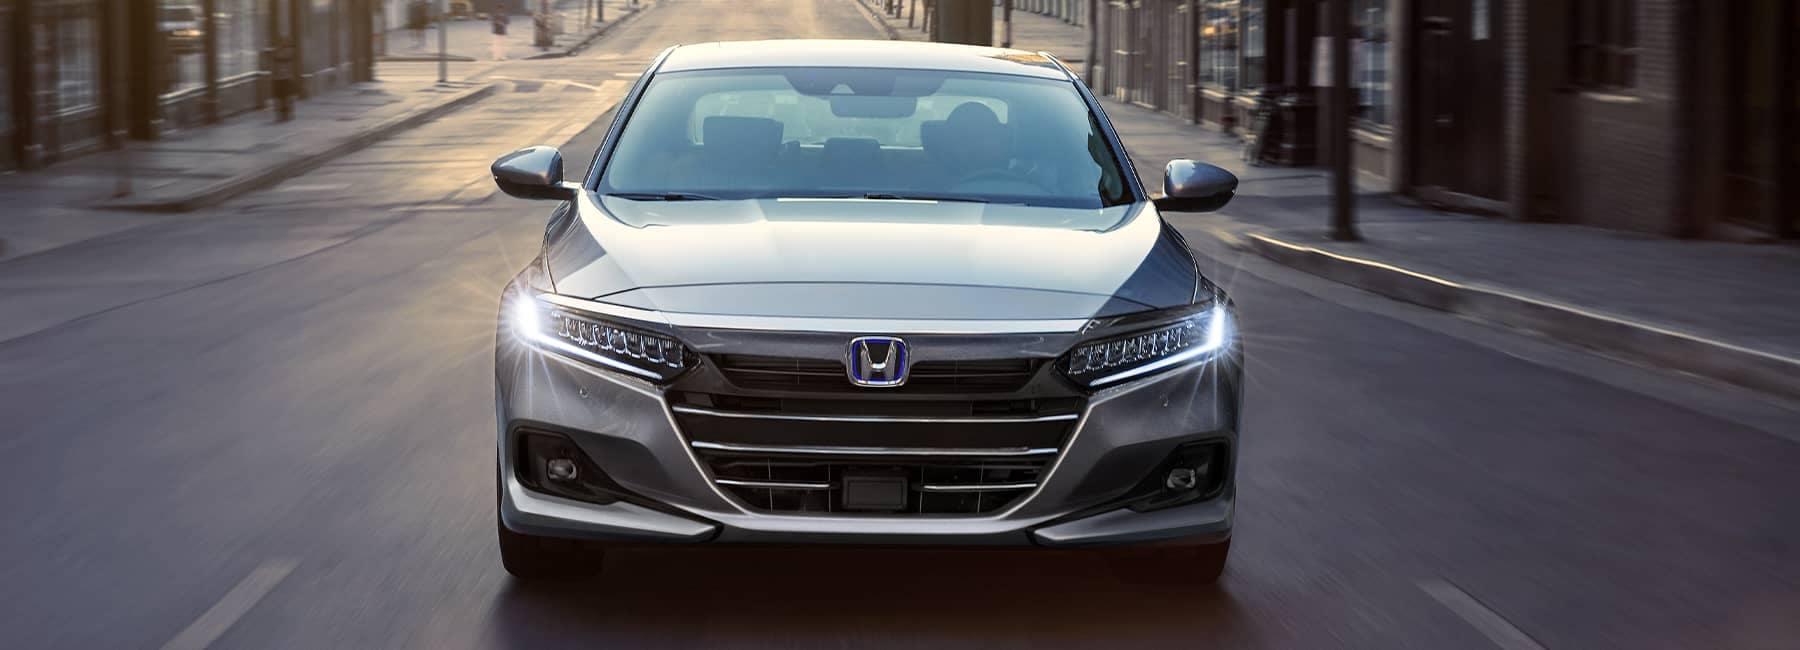 Front angle of a 2021 Silver Honda Accord driving up a city road